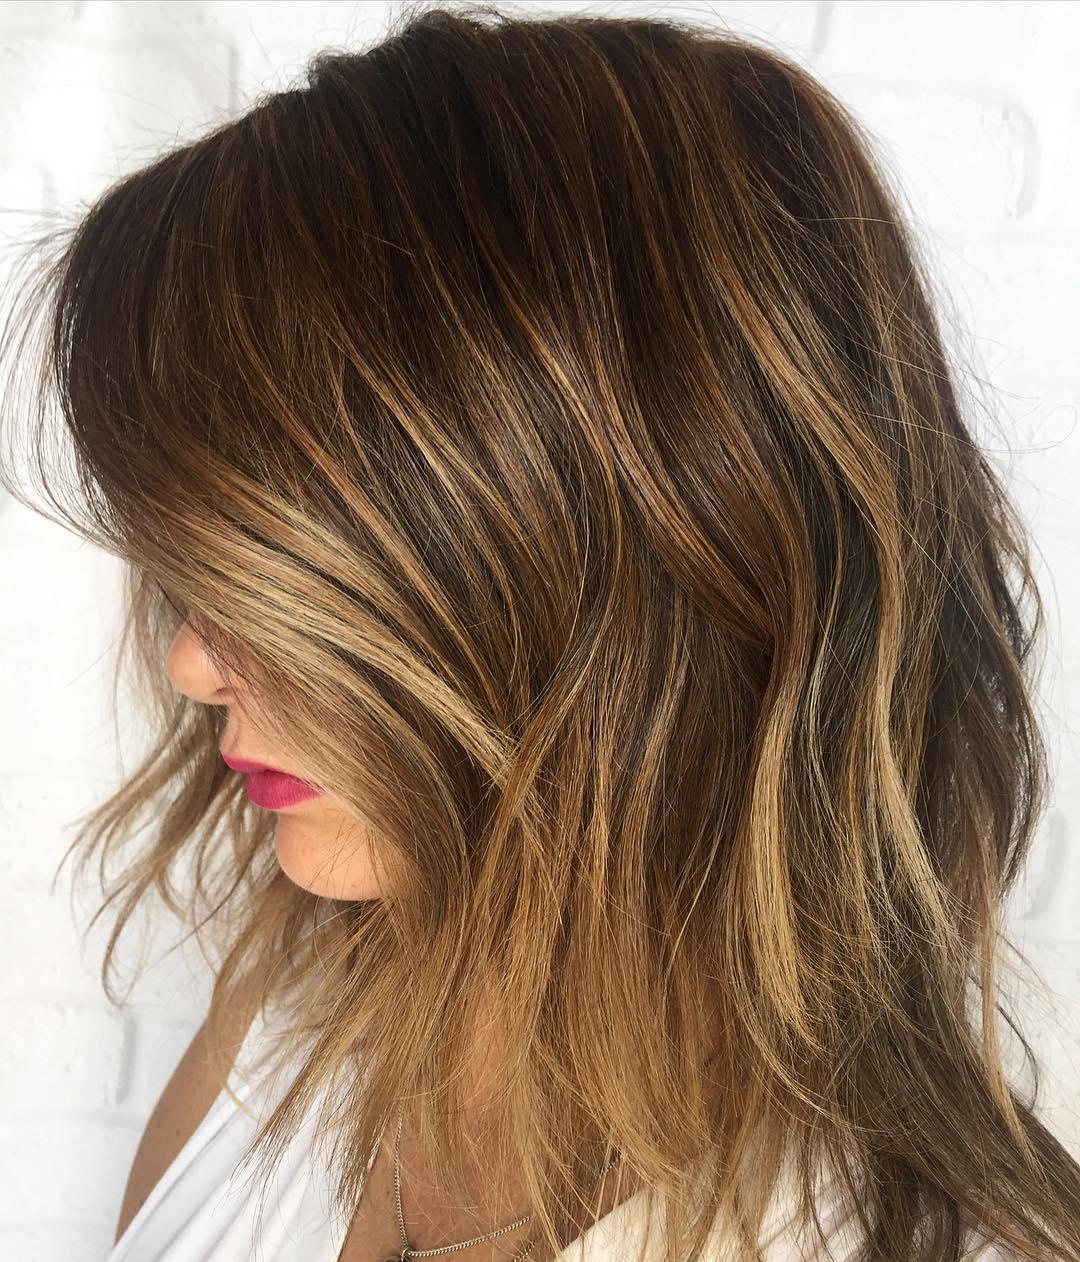 Choppy Medium Hair With Caramel Highlights